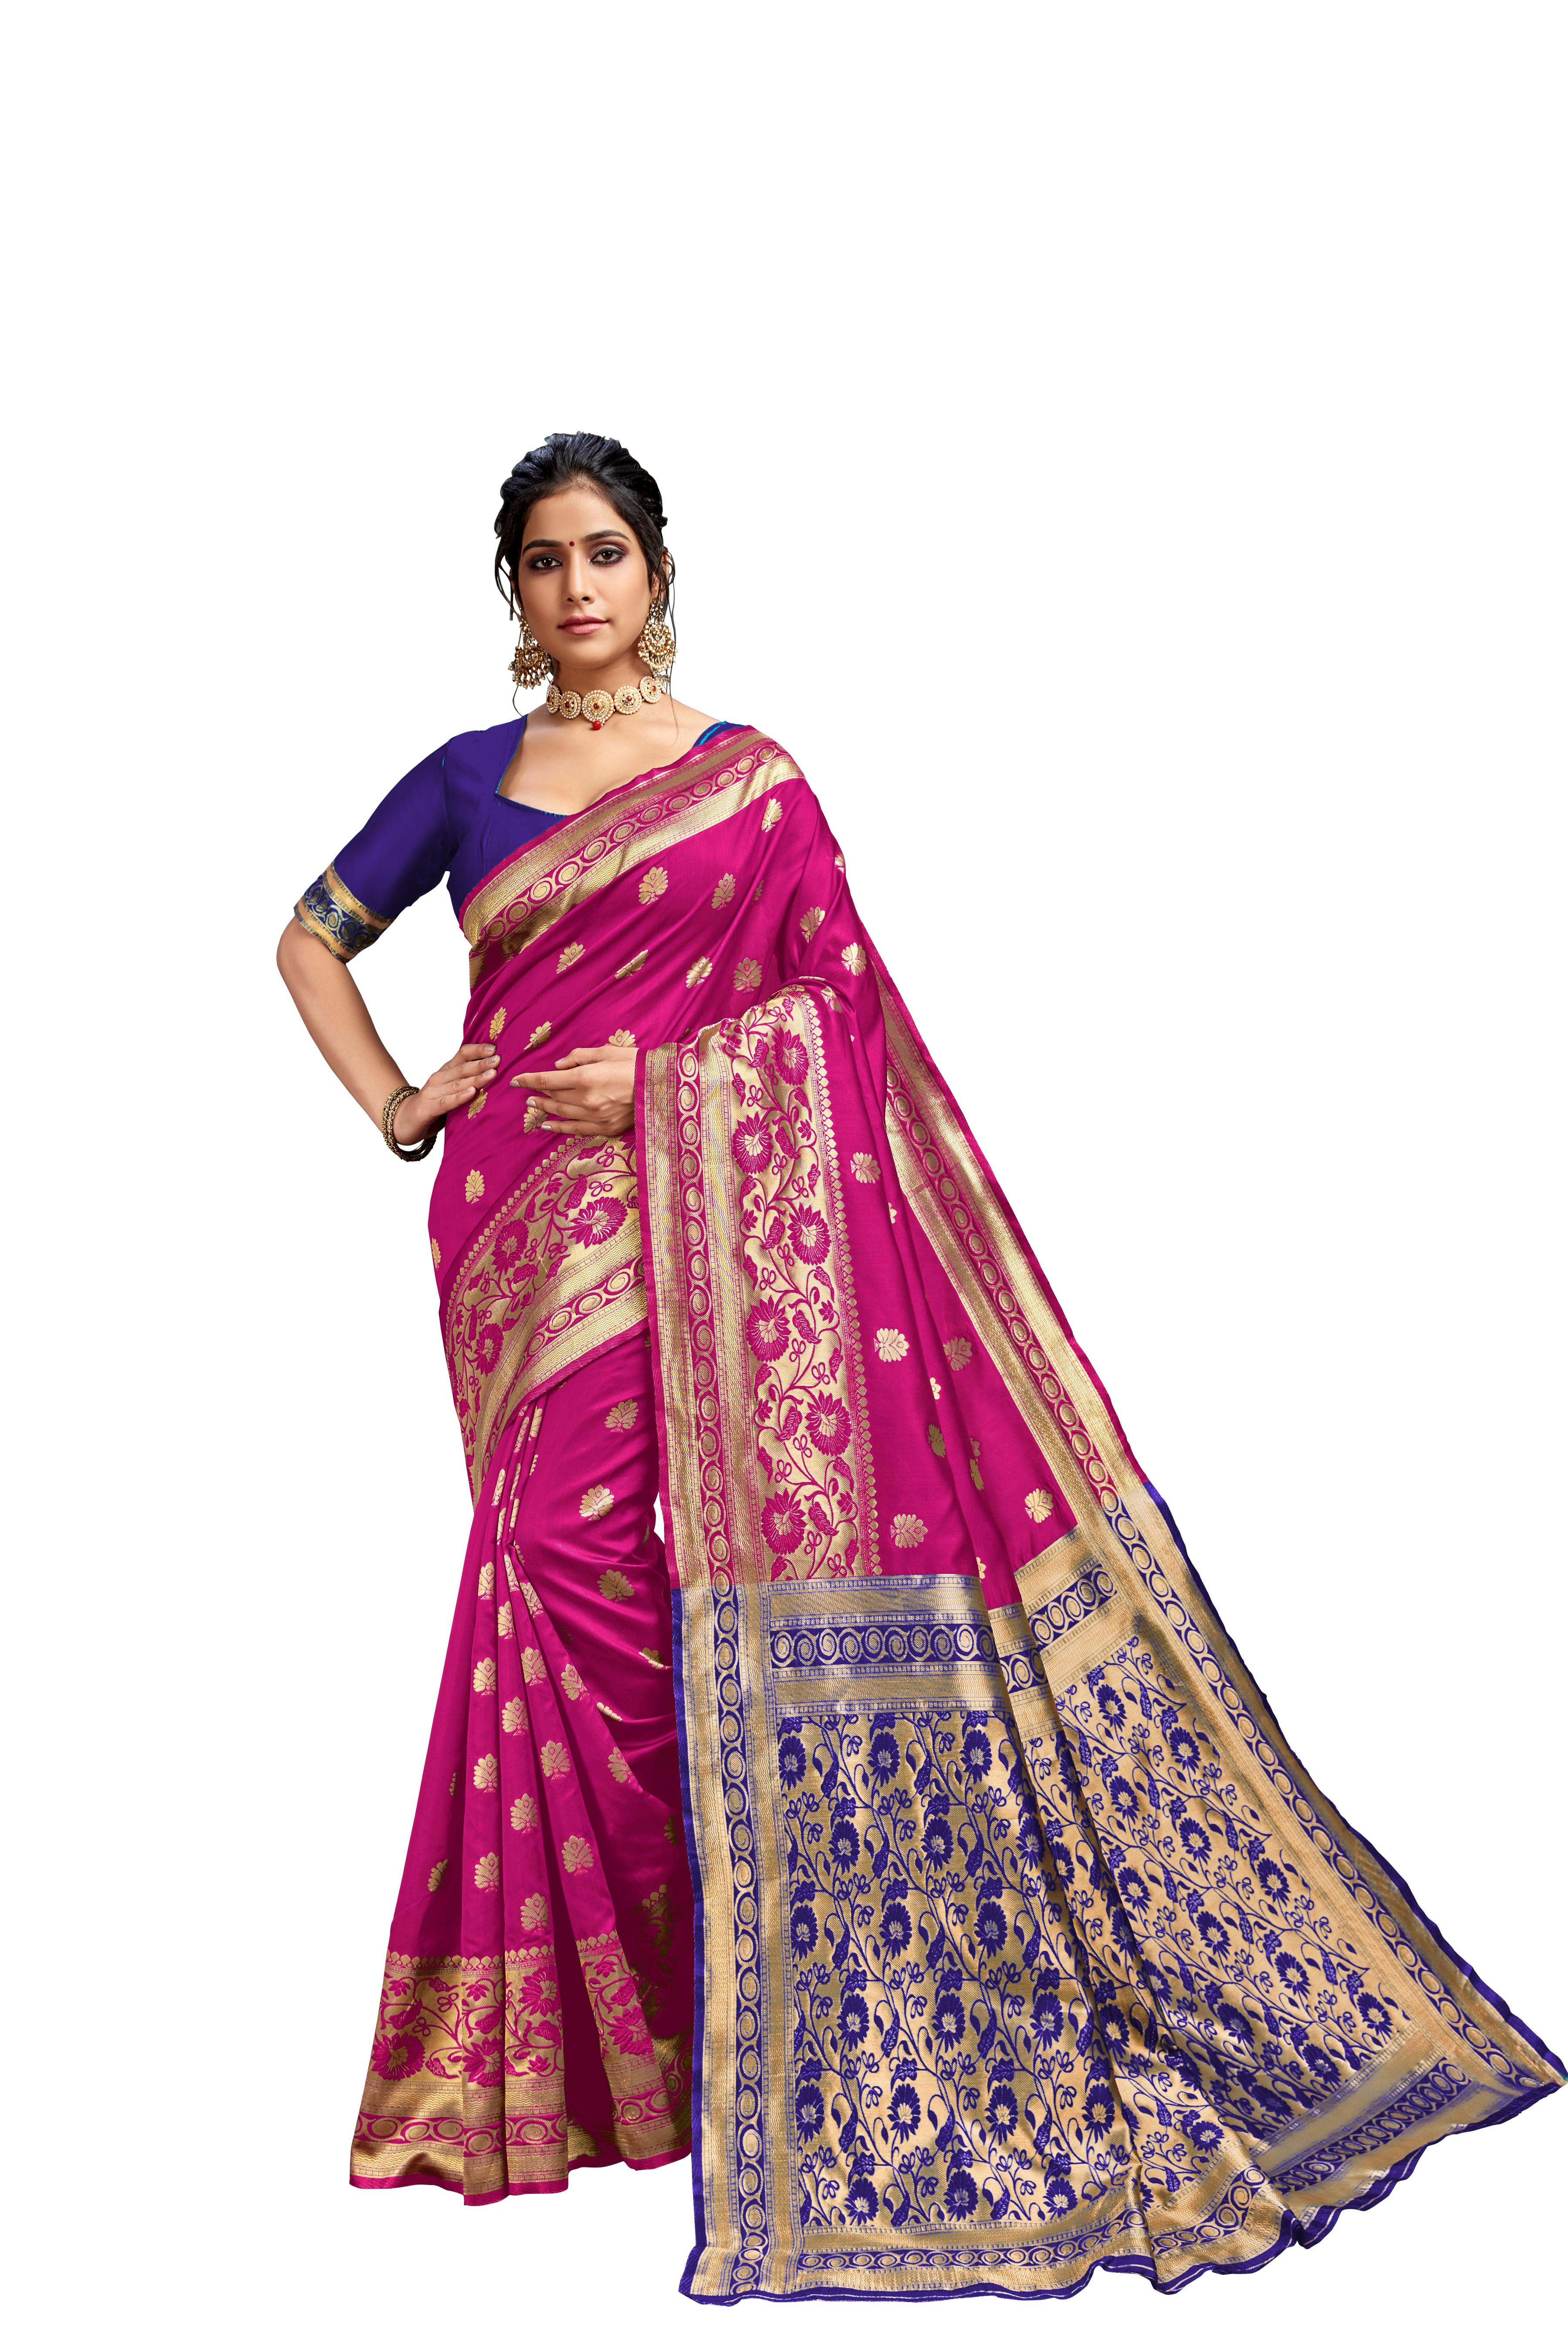 Glemora   Glemora Pink & Blue Lichi Cotton Kalpana Saree With Unstitched Blouse